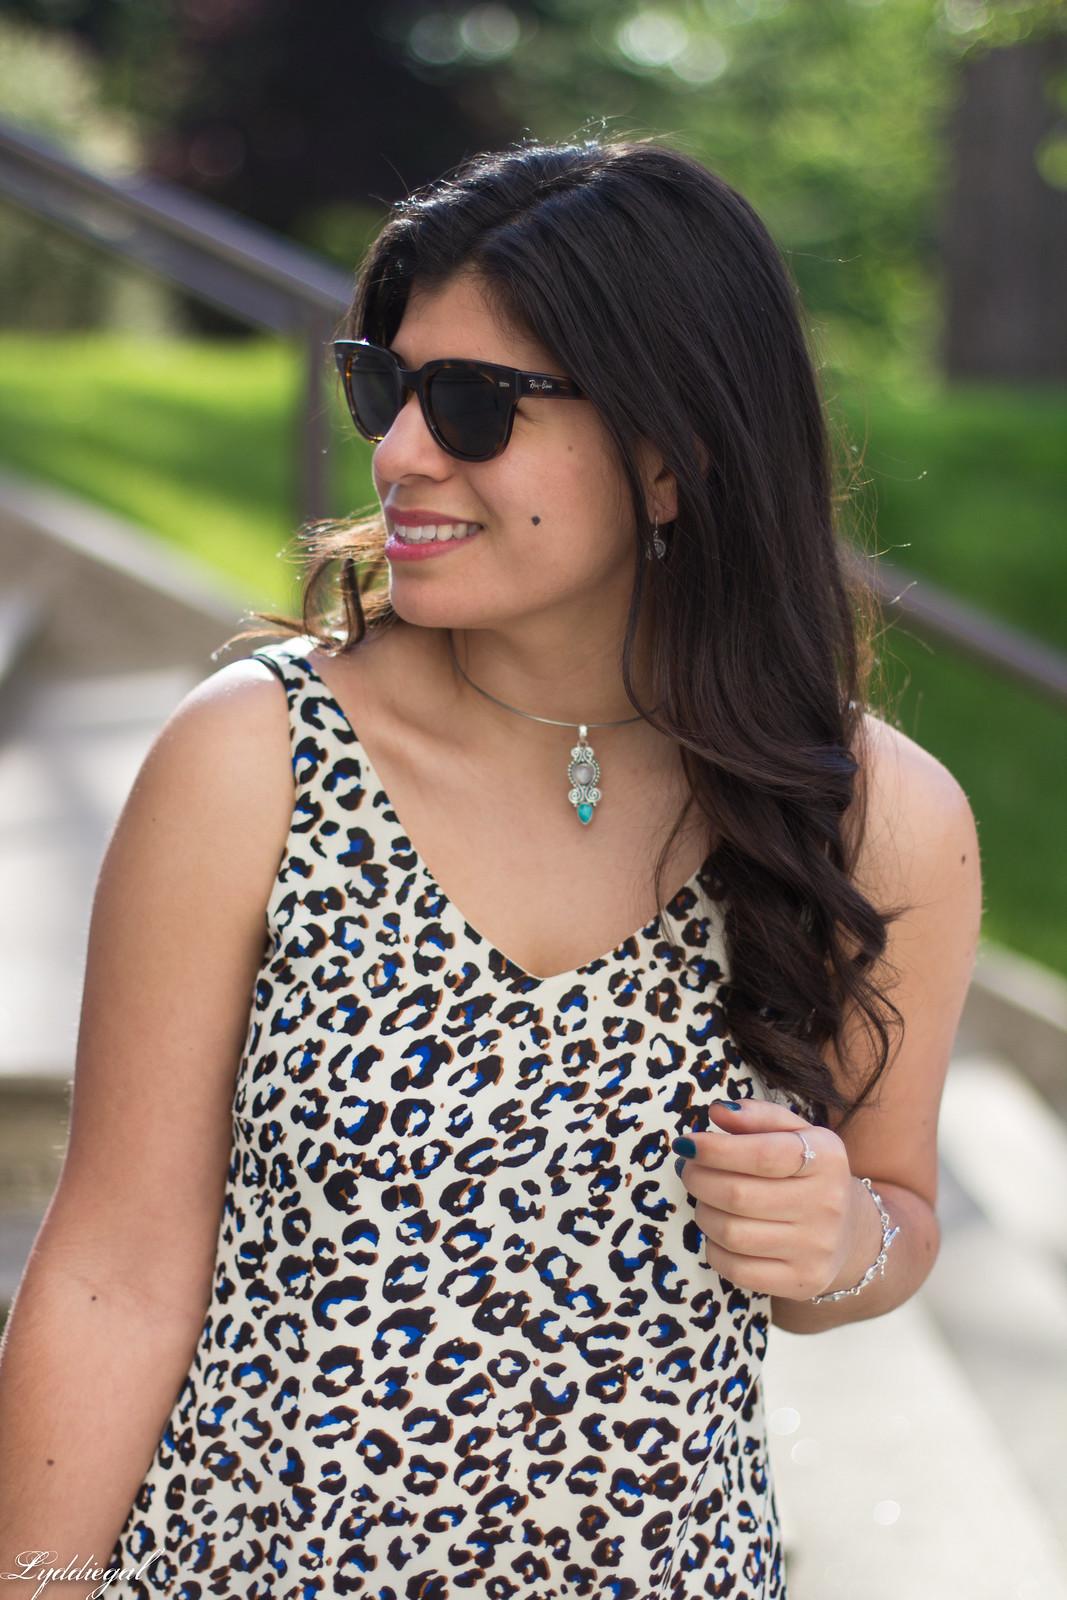 leopard print dress, denim jacket, moonstone jewelry-2.jpg